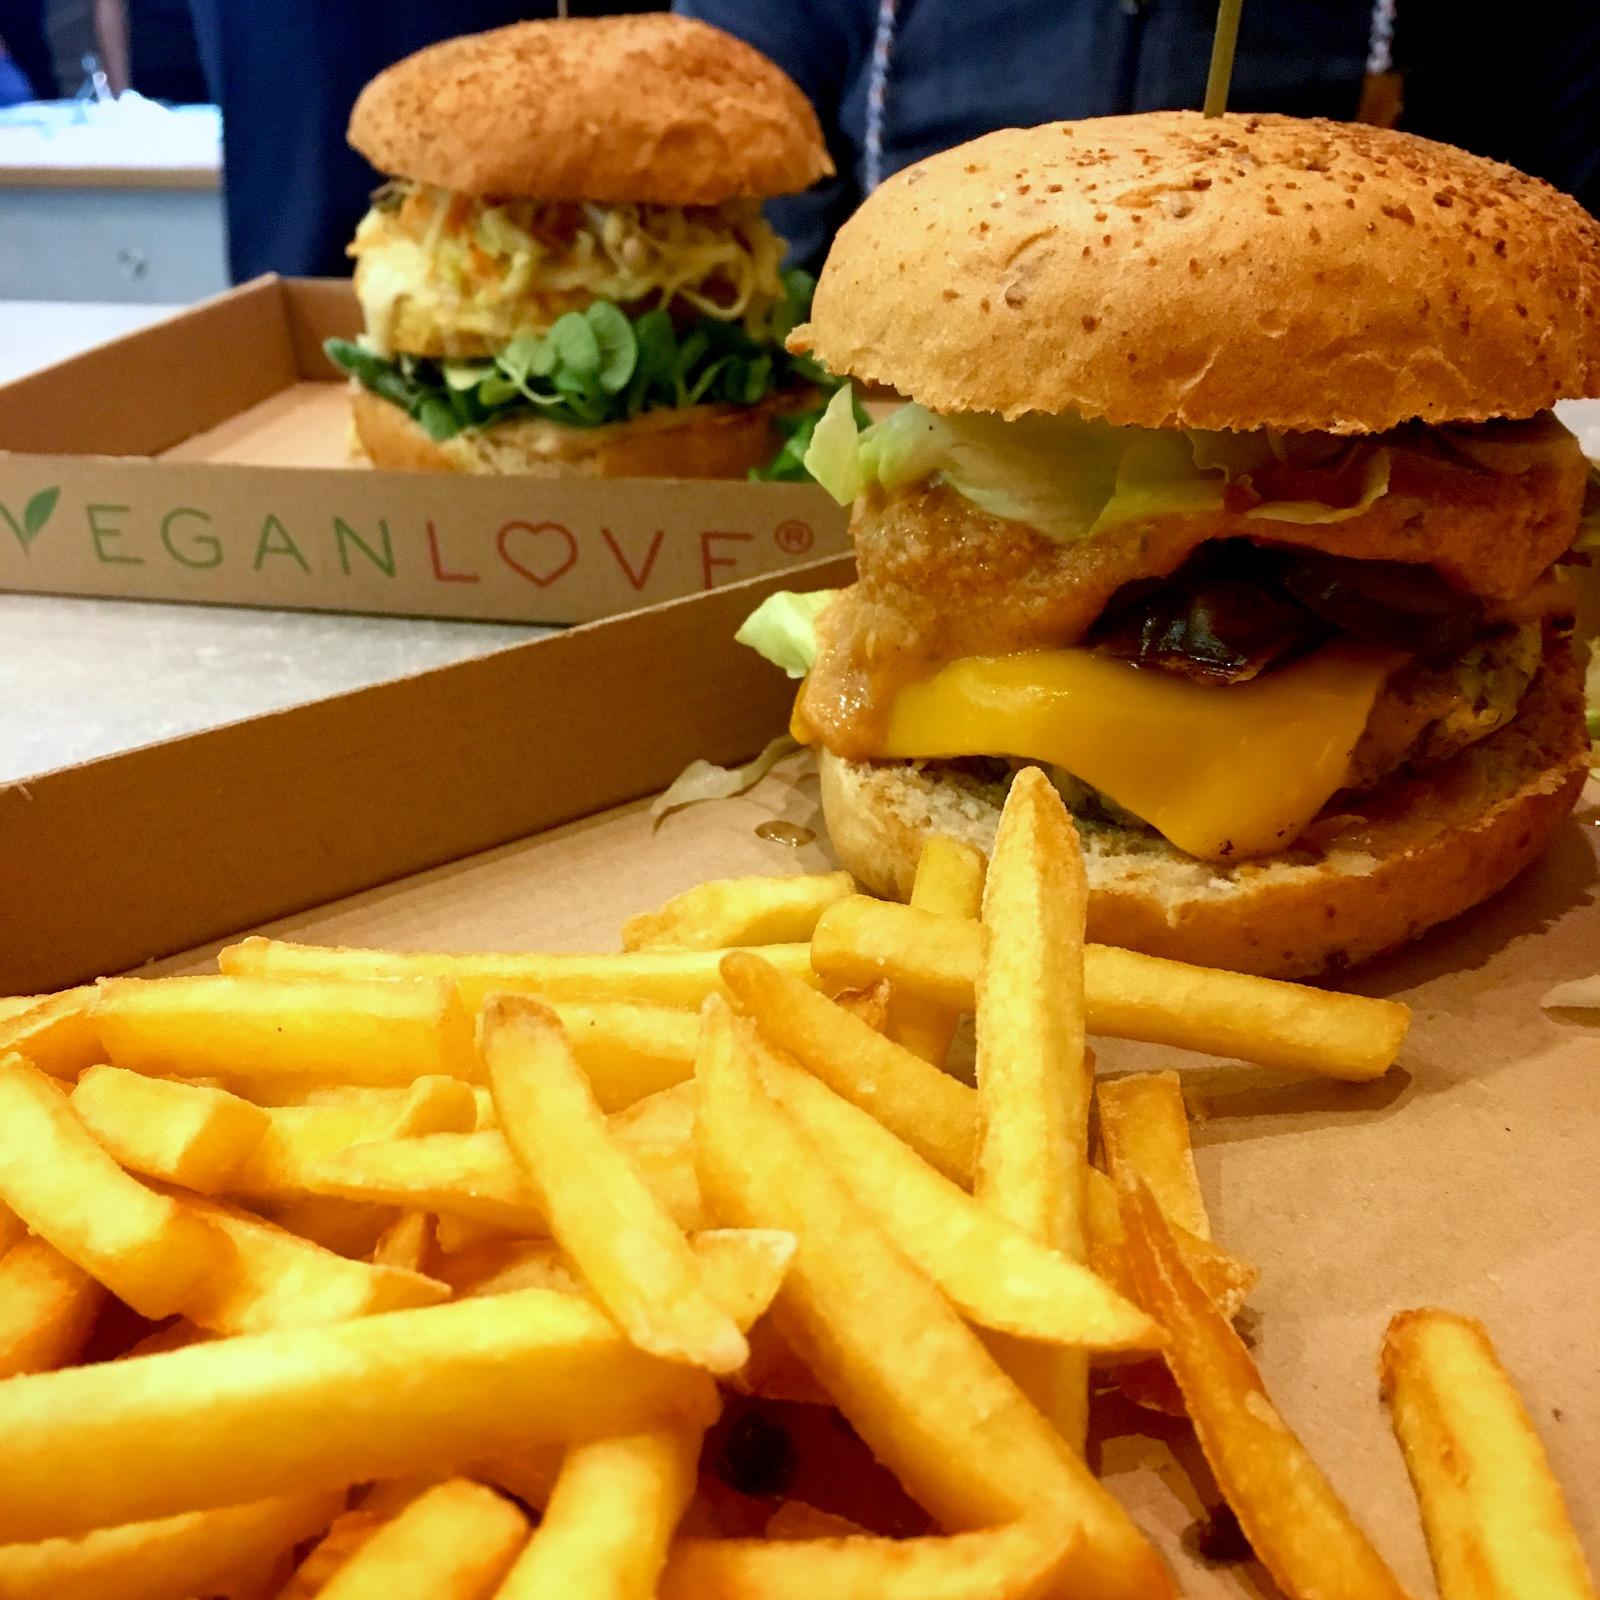 Vegan Love Budapest - one of the best vegan burgers in Budapest